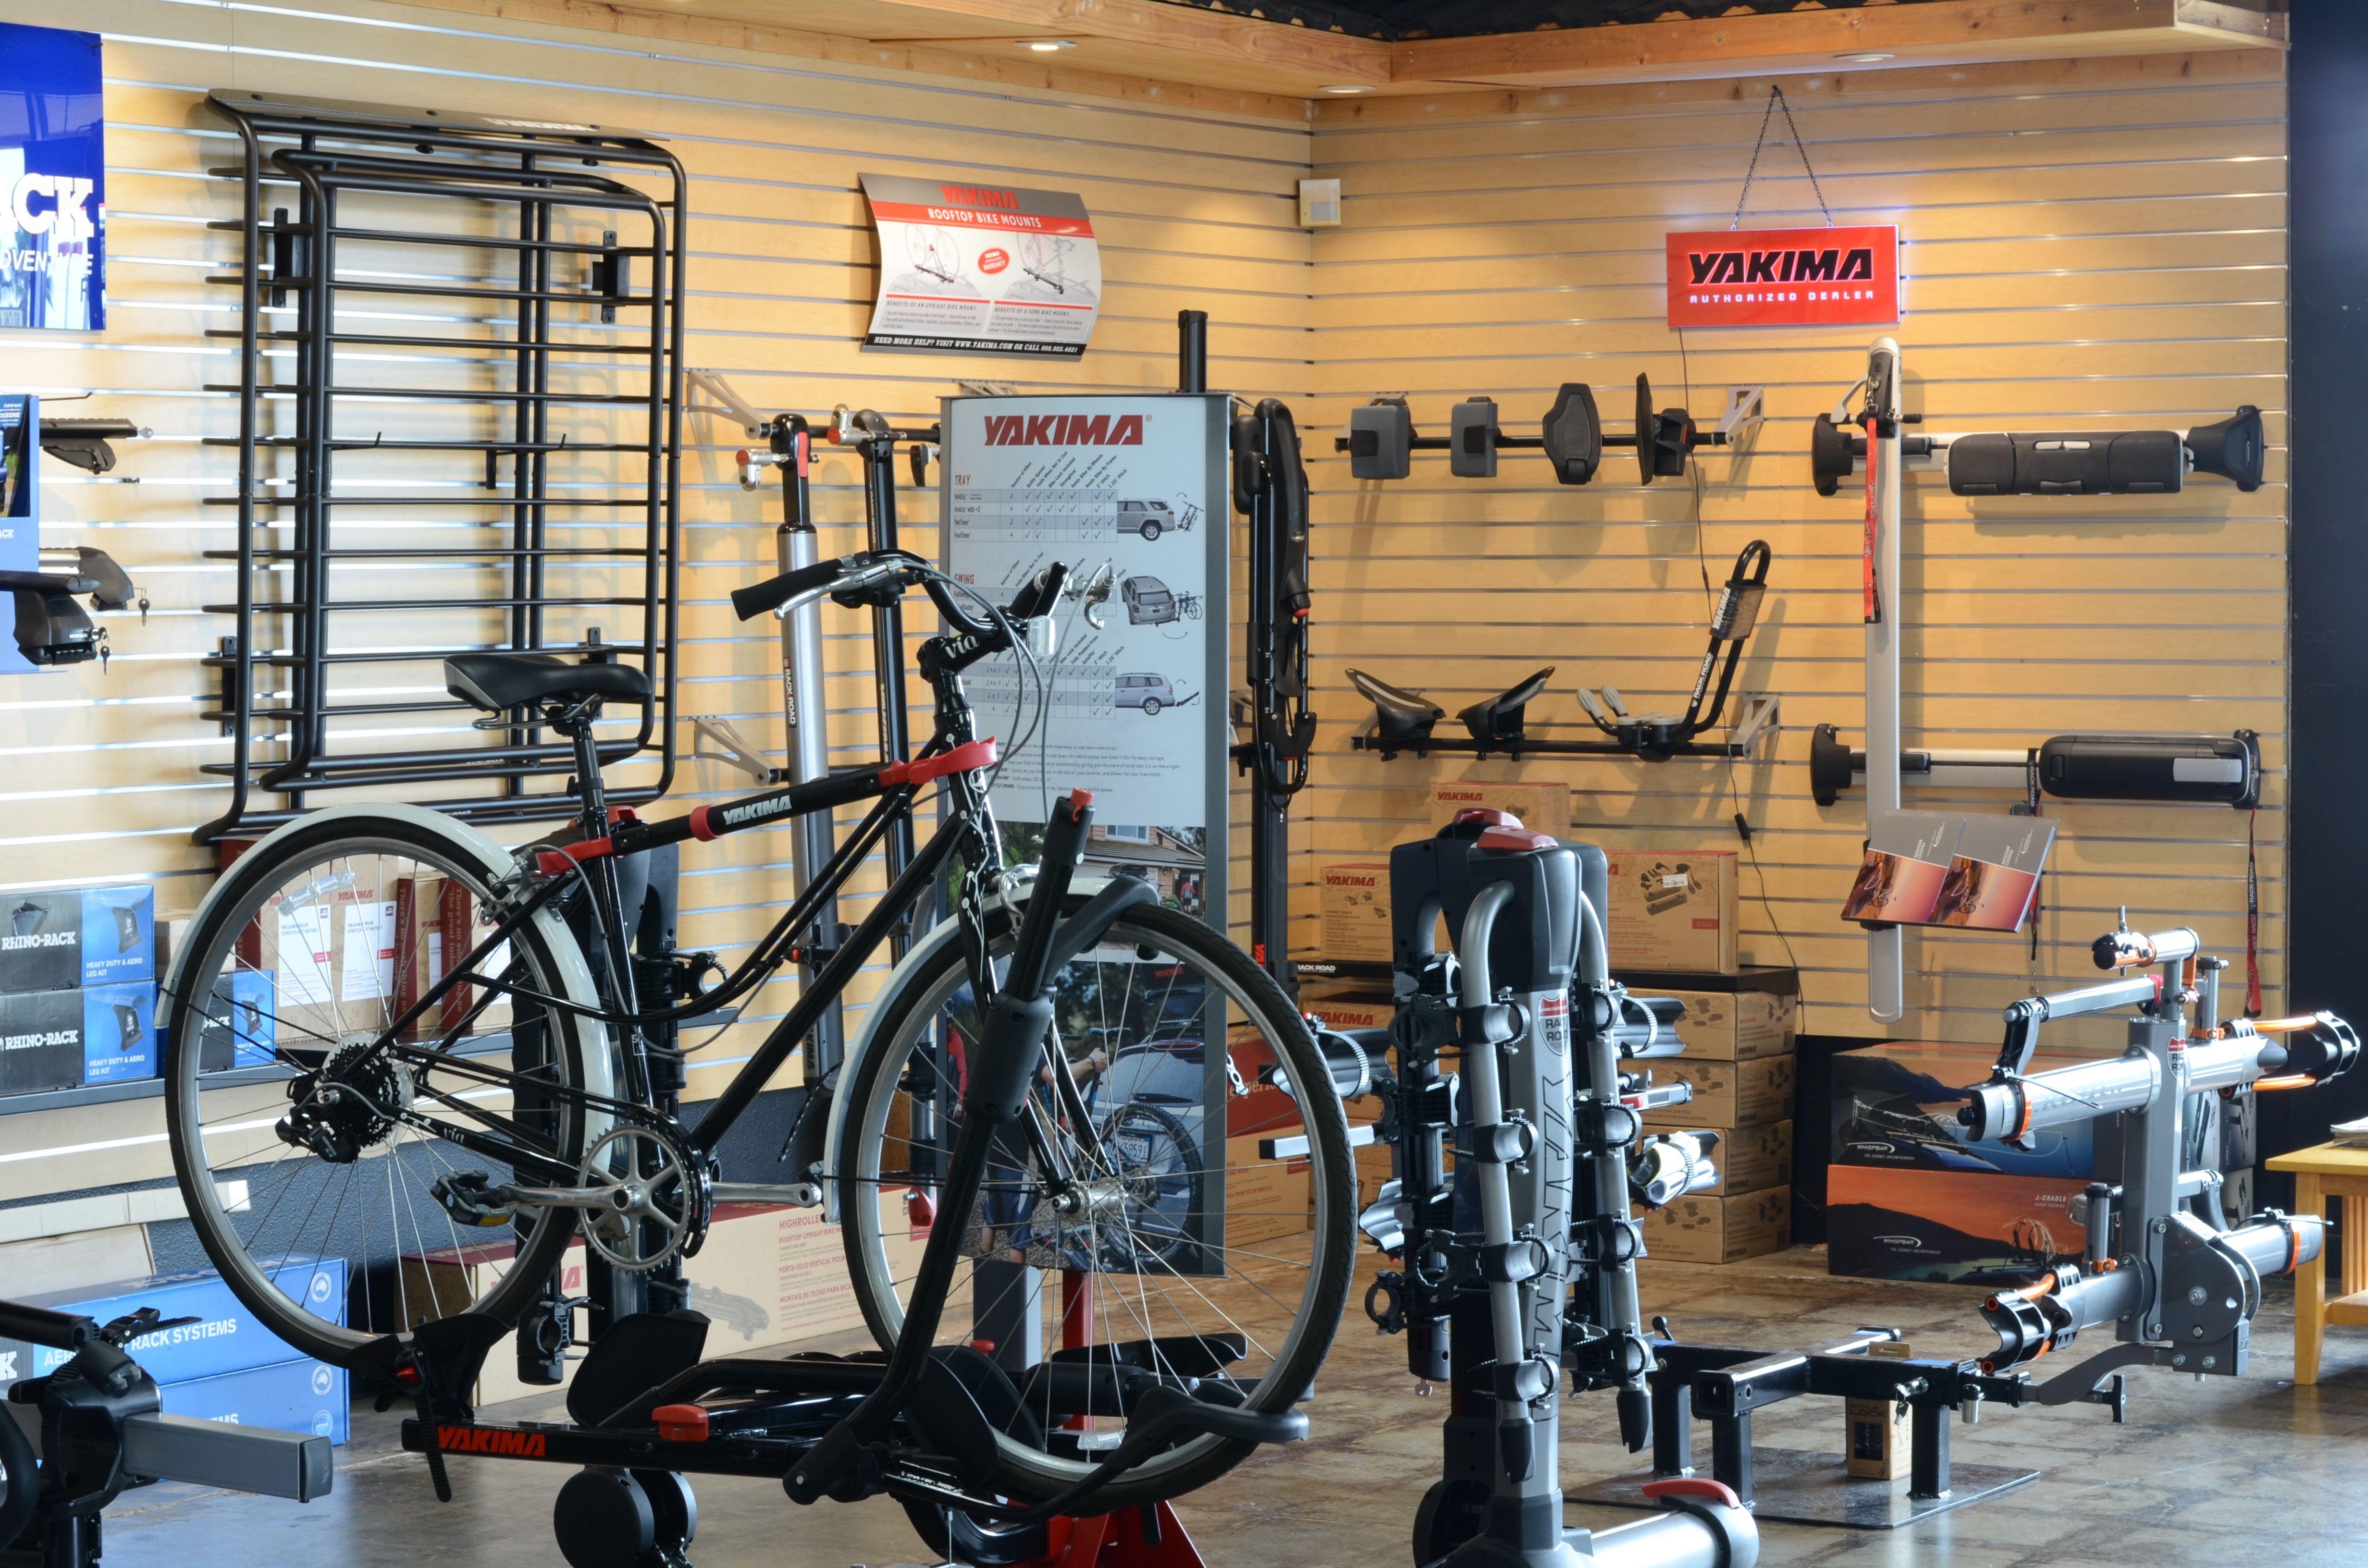 Yakima Thule Racks For Car And Bike Car Racks Bike Trailer Hitch Bike